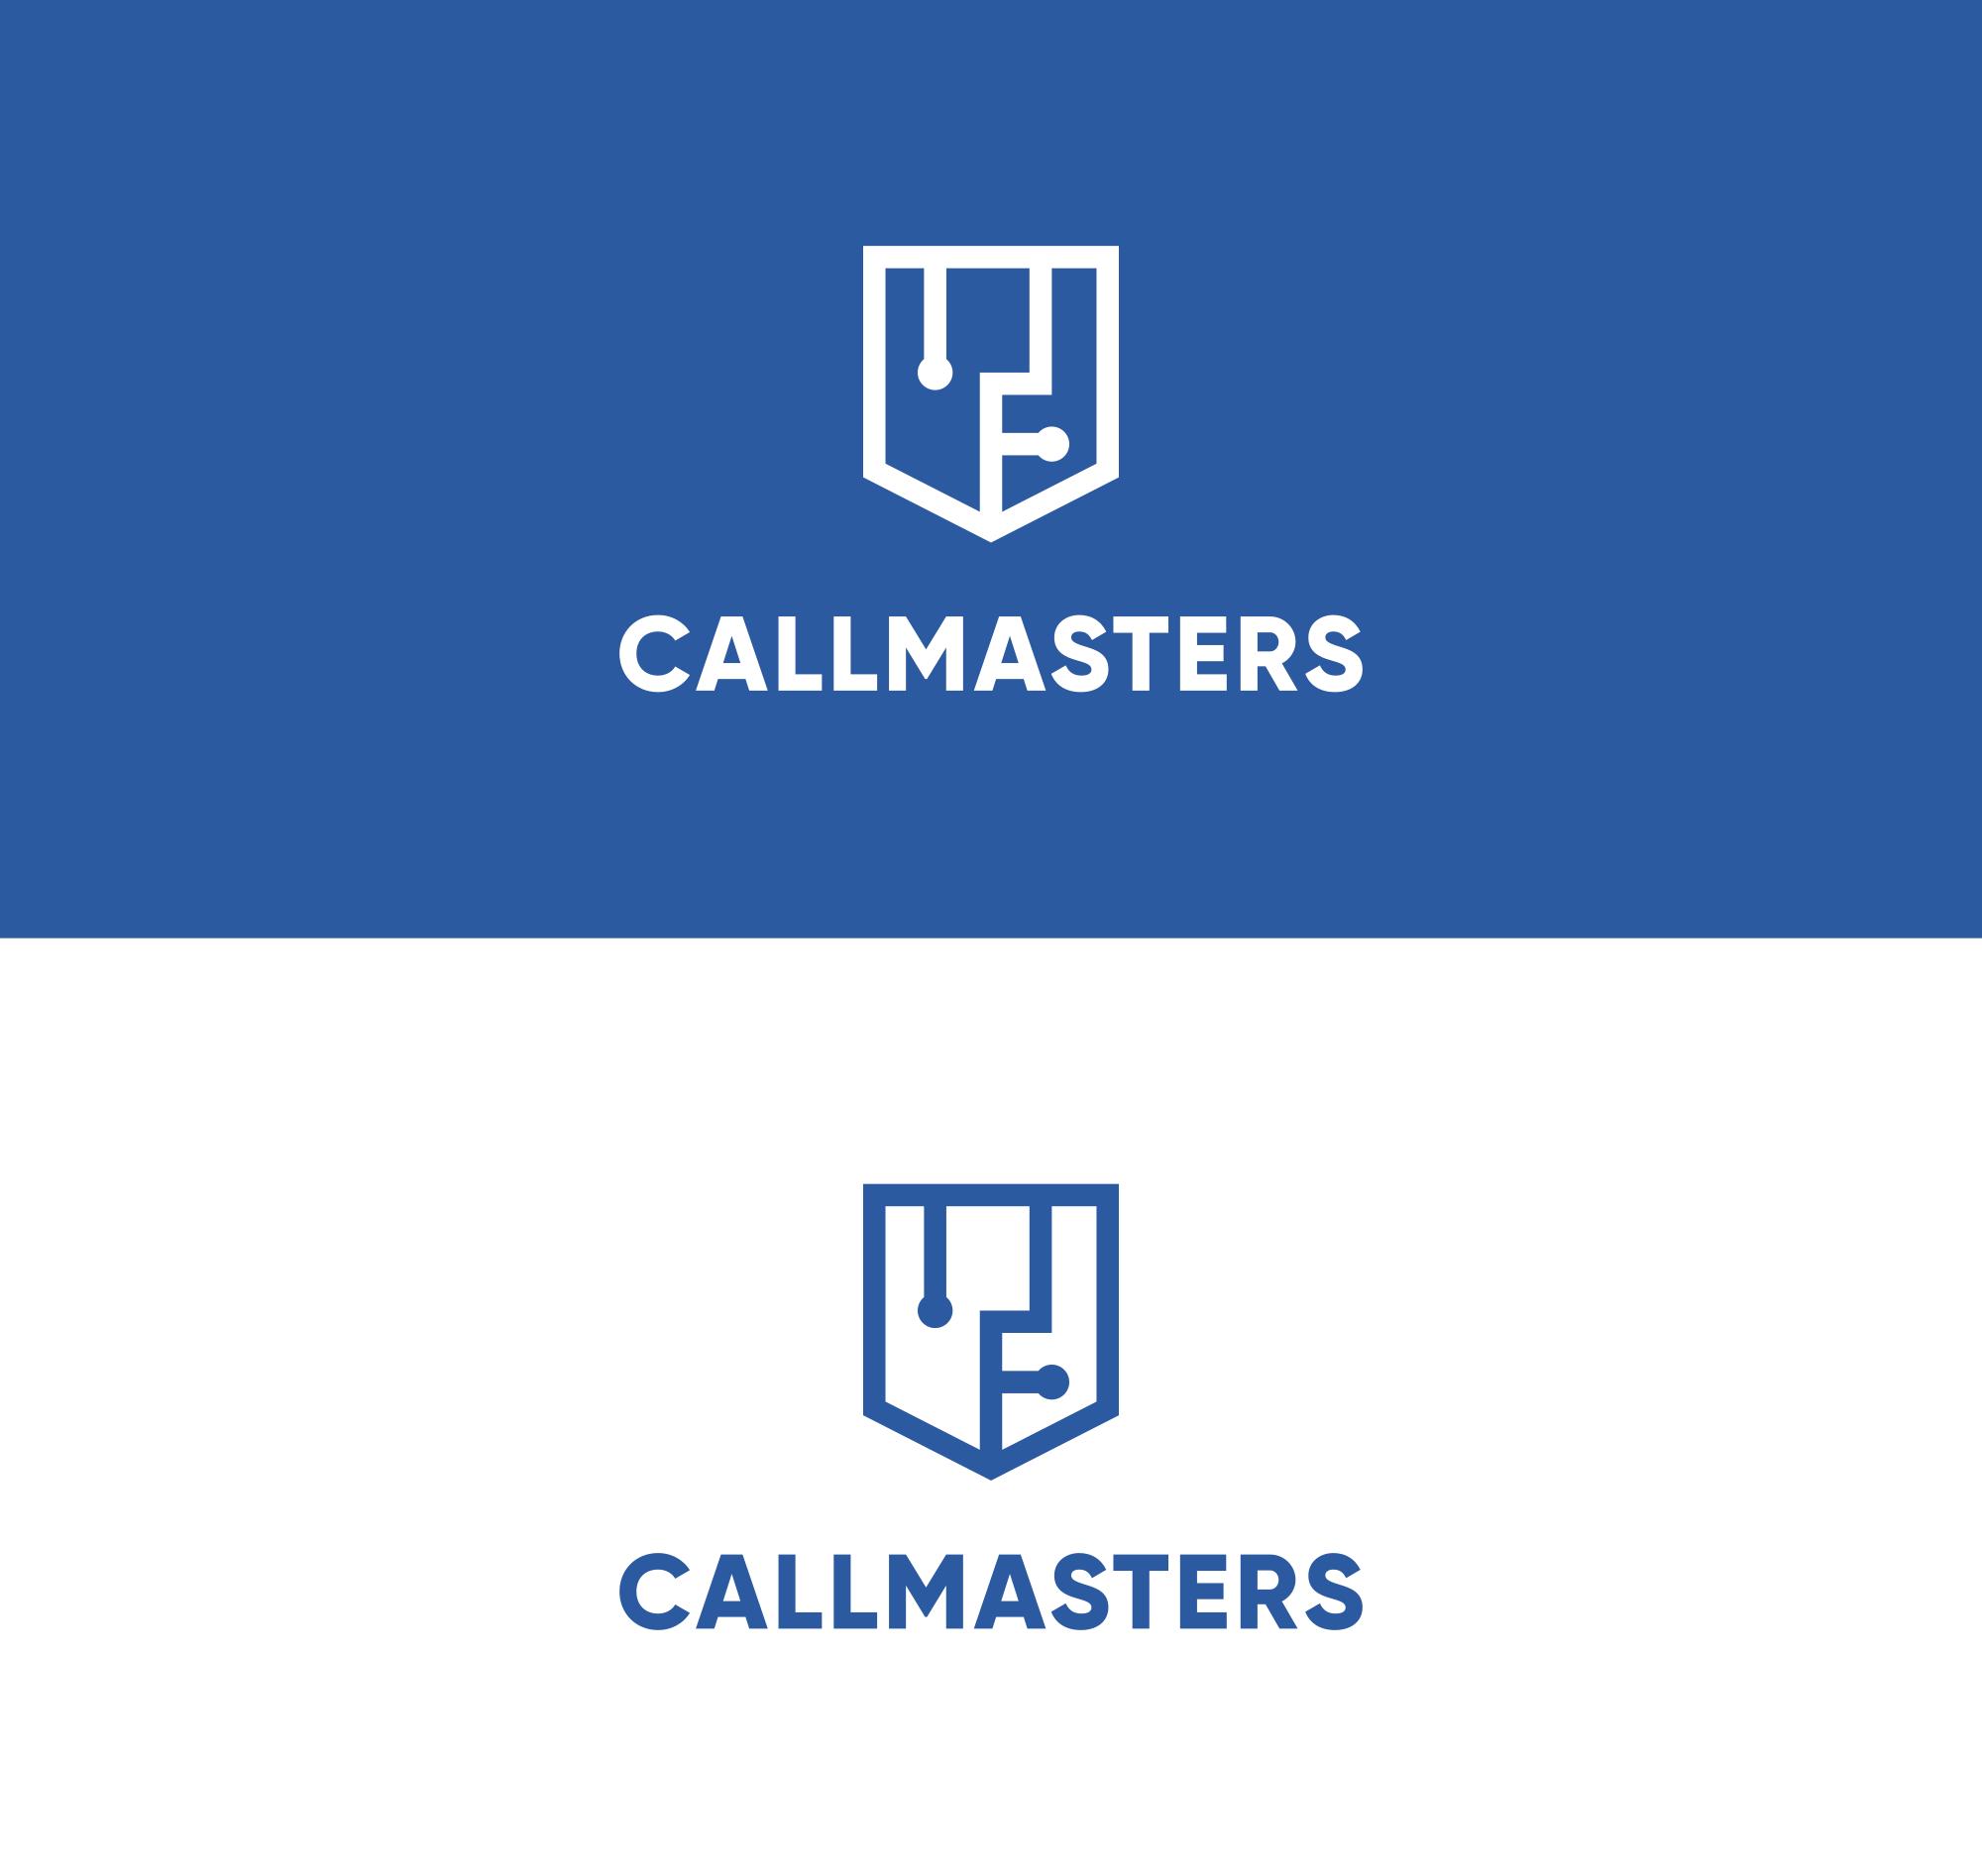 Логотип call-центра Callmasters  фото f_7385b73330bc3dd9.png